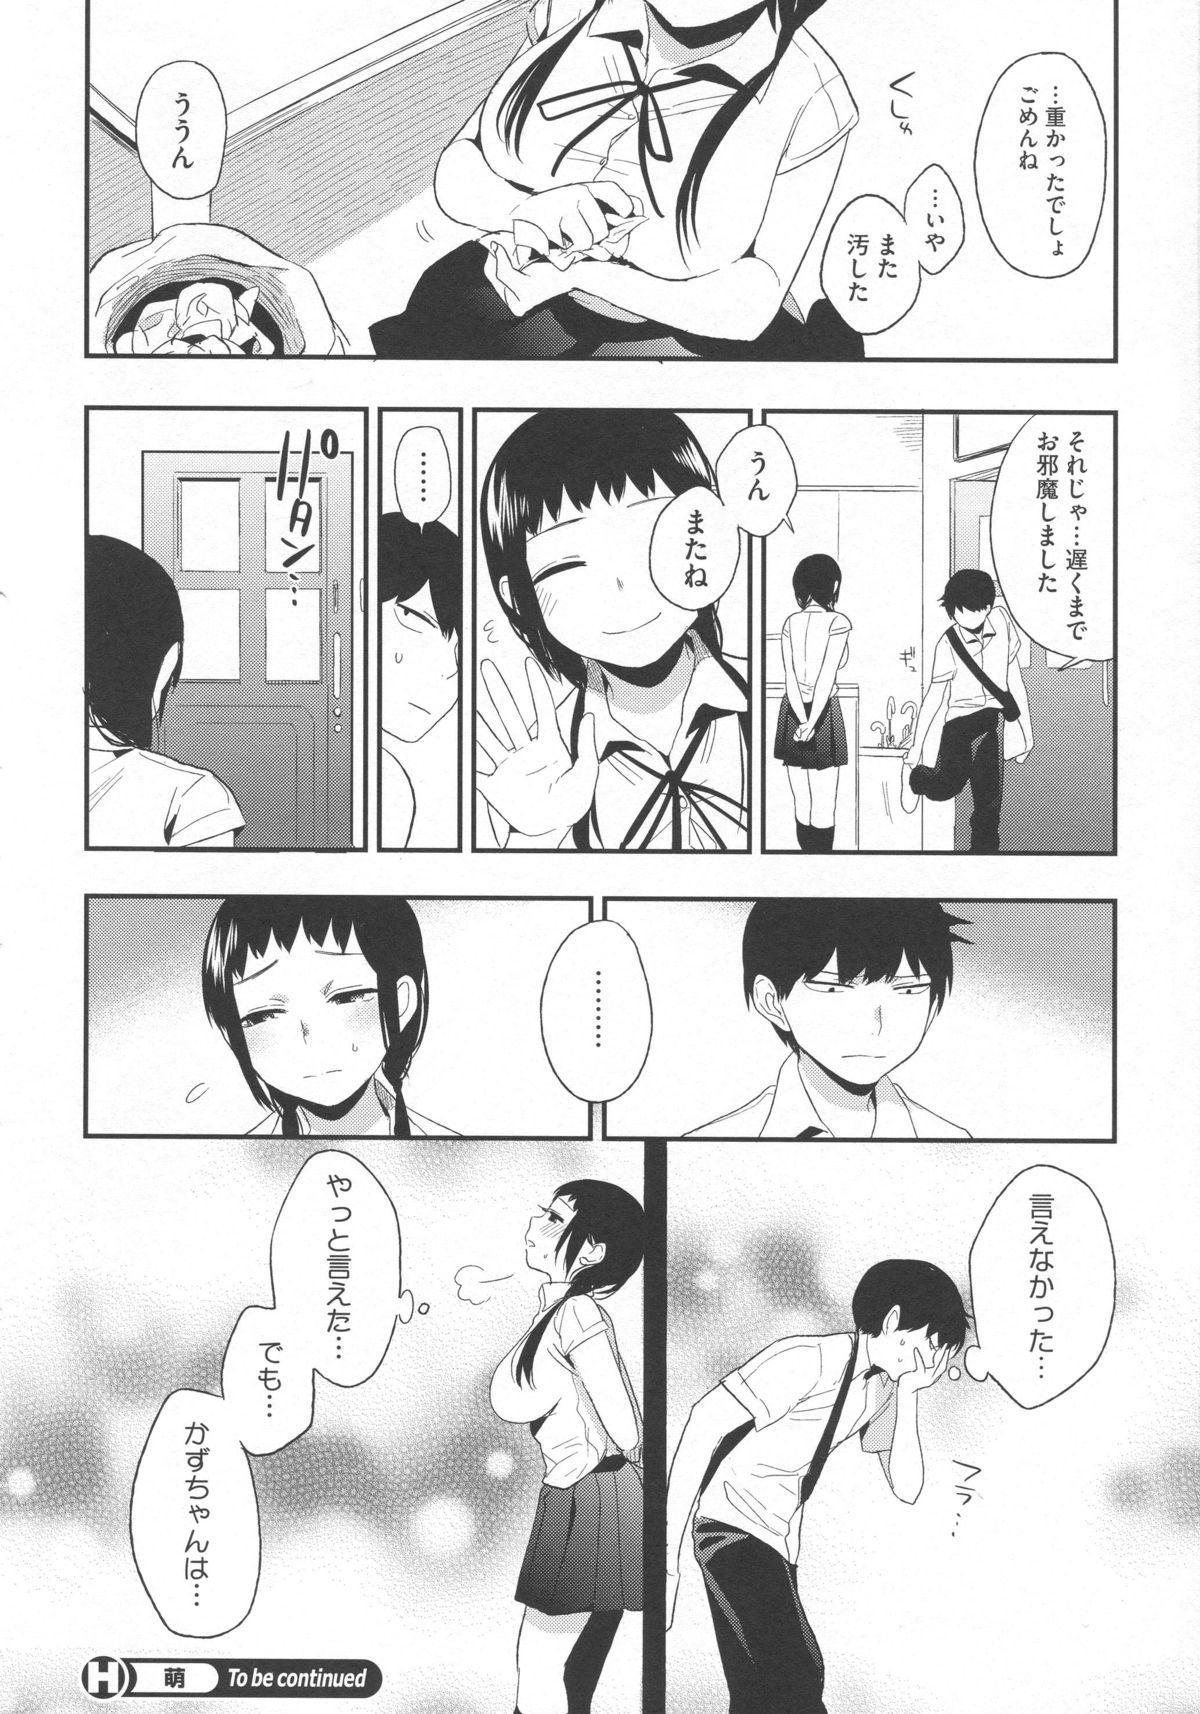 Boku Dake no Yuuyami - Only My Twilight 36